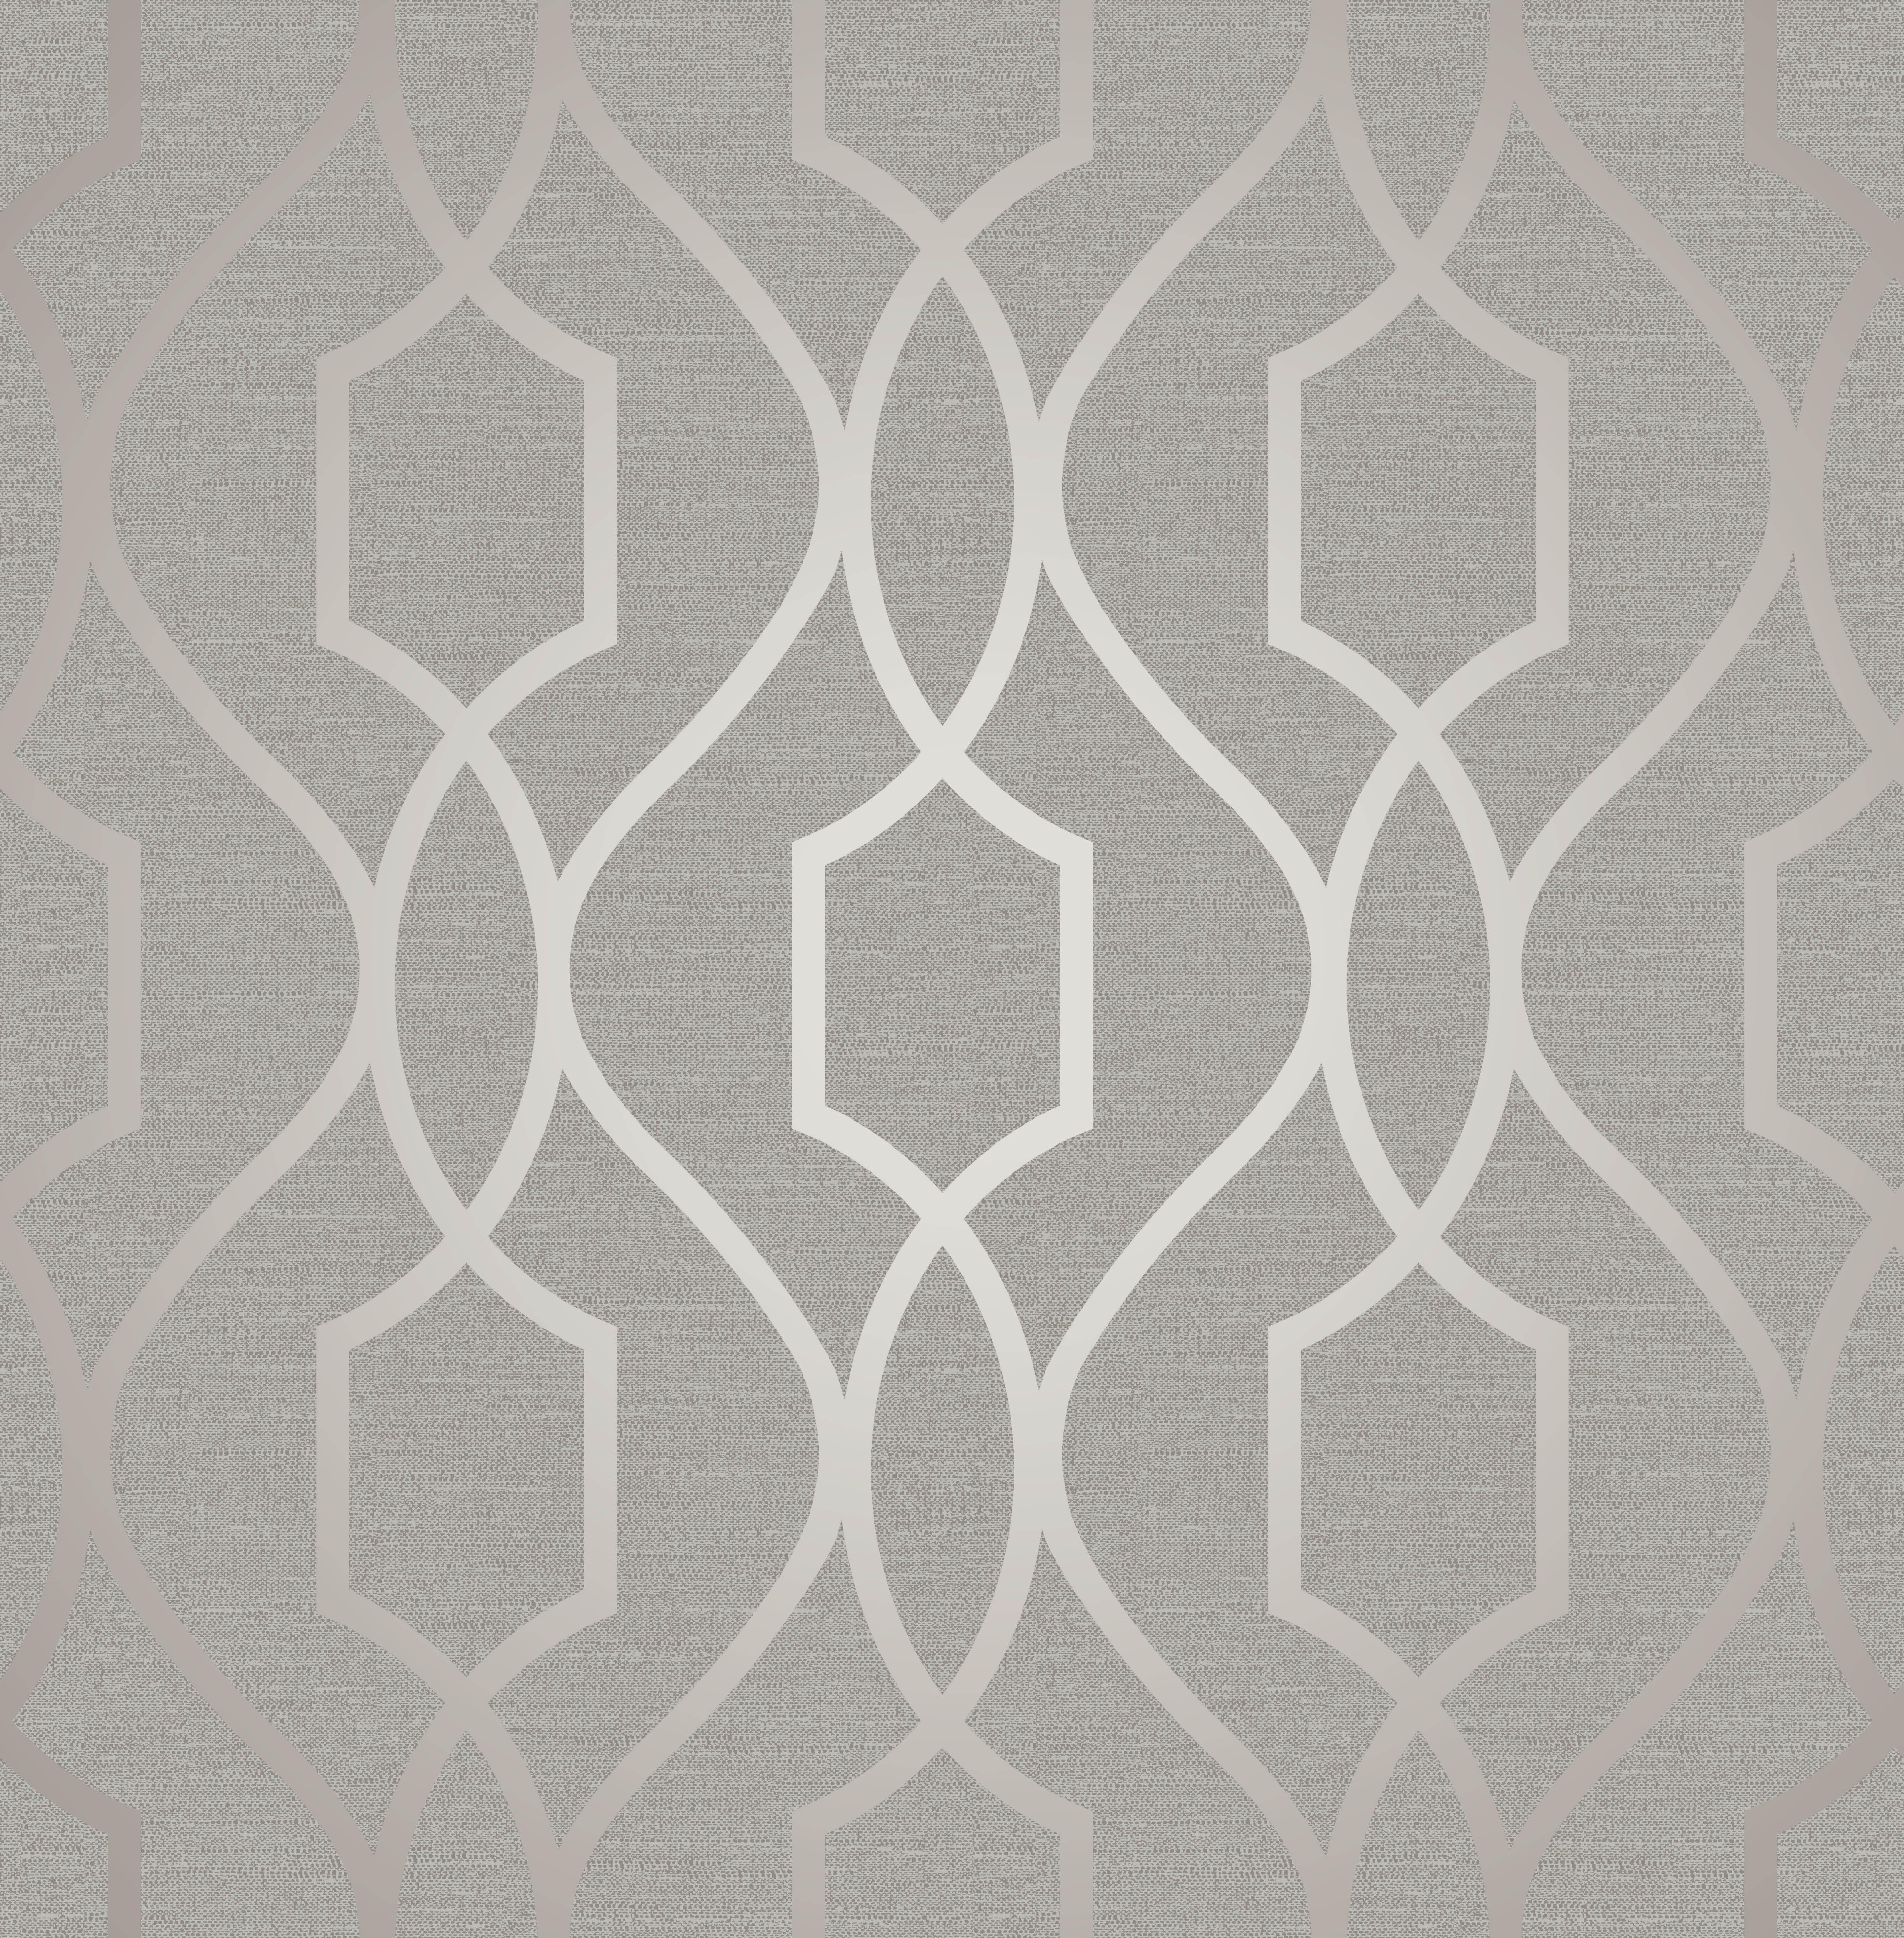 Geometric Wallpaper Metallic Shiny Grey Taupe Apex 3D Modern Fine Decor